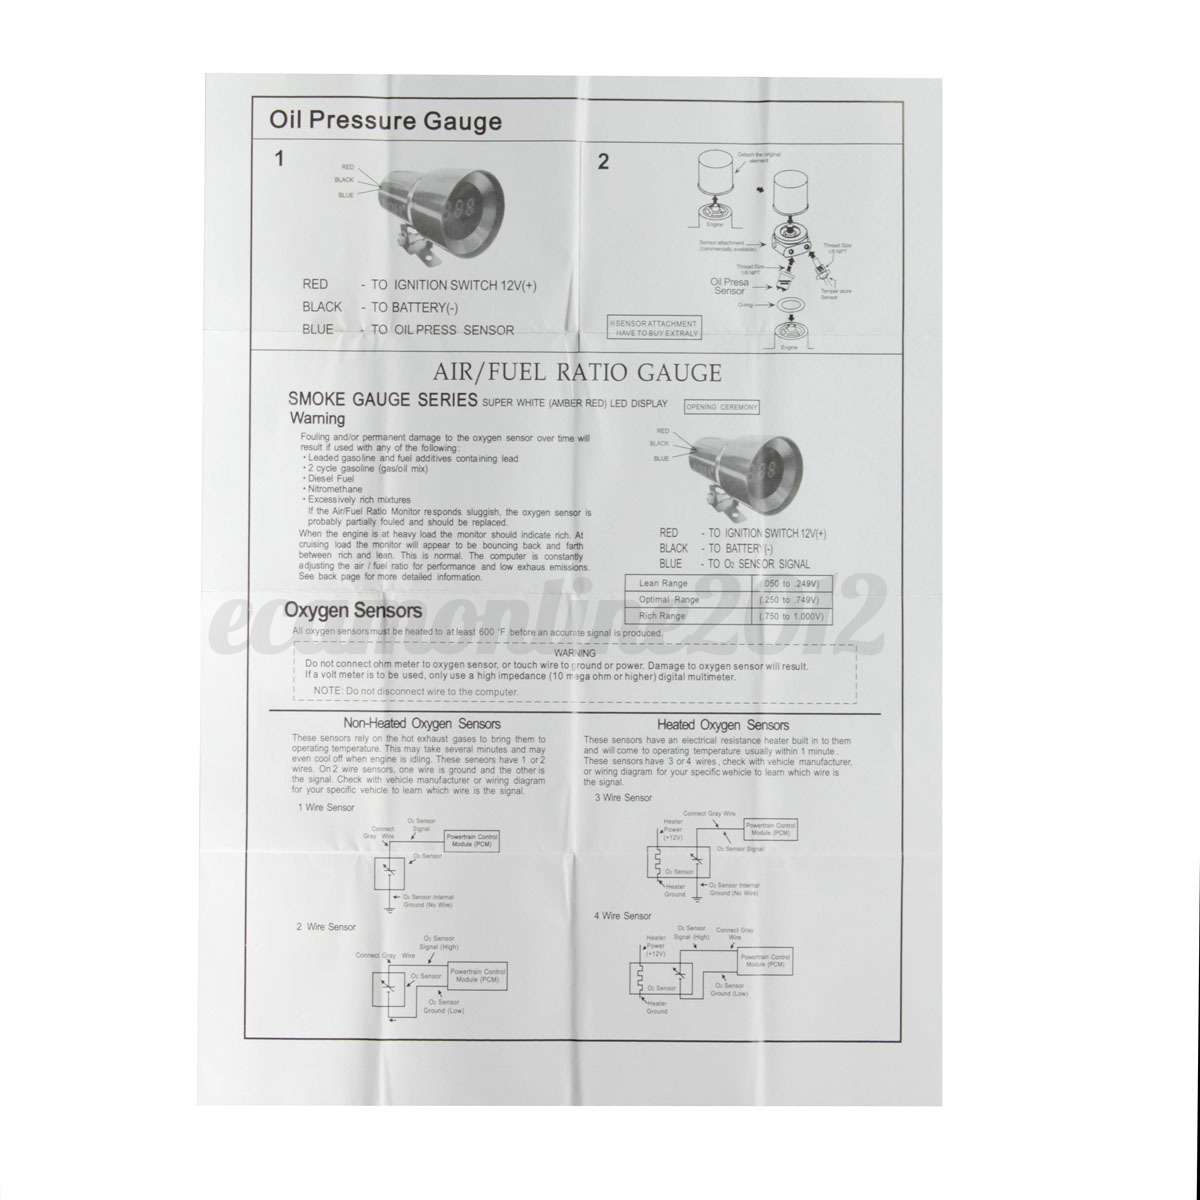 37mm Car Led Oil Press Pressure Gauge Meter Pointer Sensor Digital 3 Wire O2 Wiring Diagram Detail Image